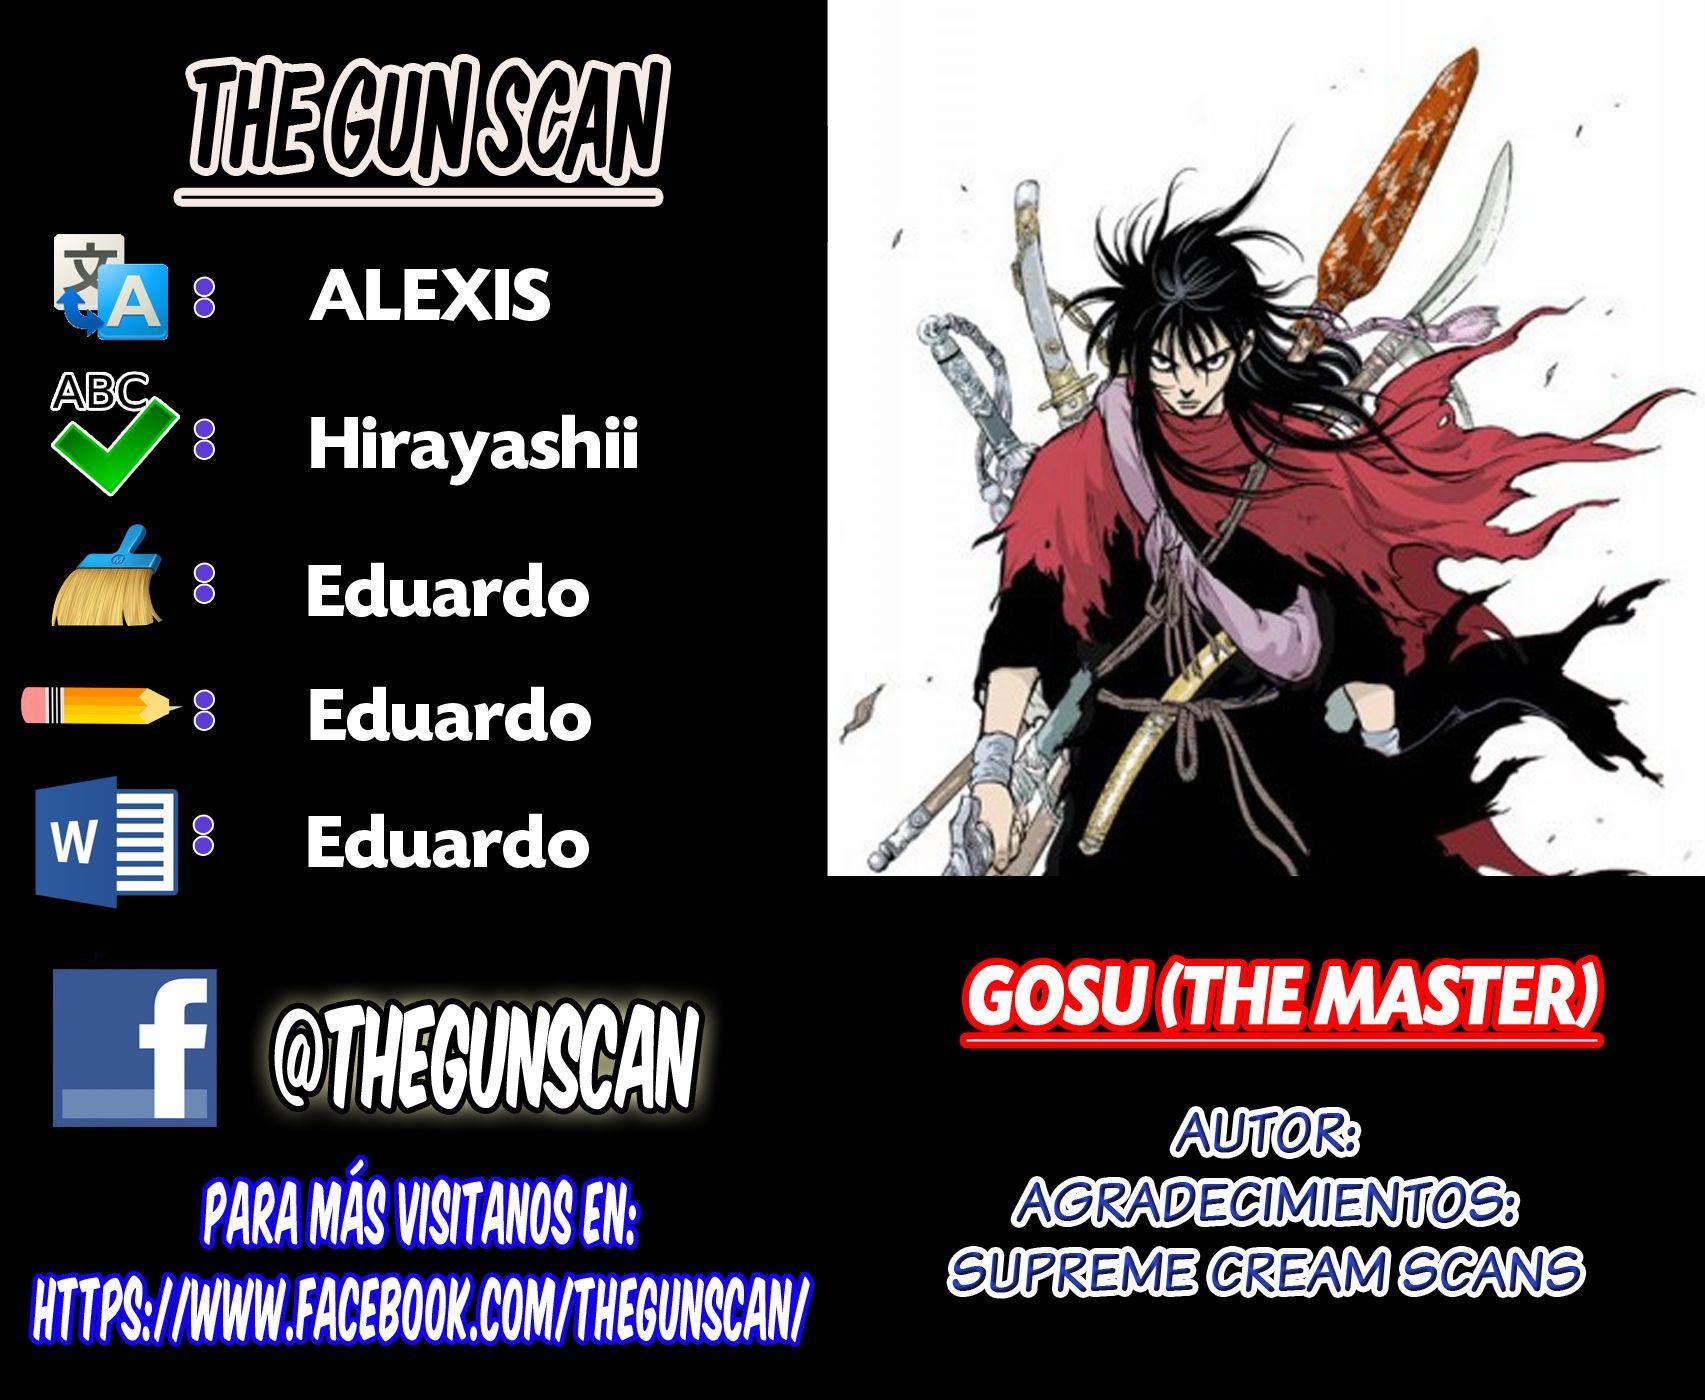 https://c5.ninemanga.com/es_manga/9/18249/486039/7dea0e3bf353aa76b7af76ad8b70b186.jpg Page 1